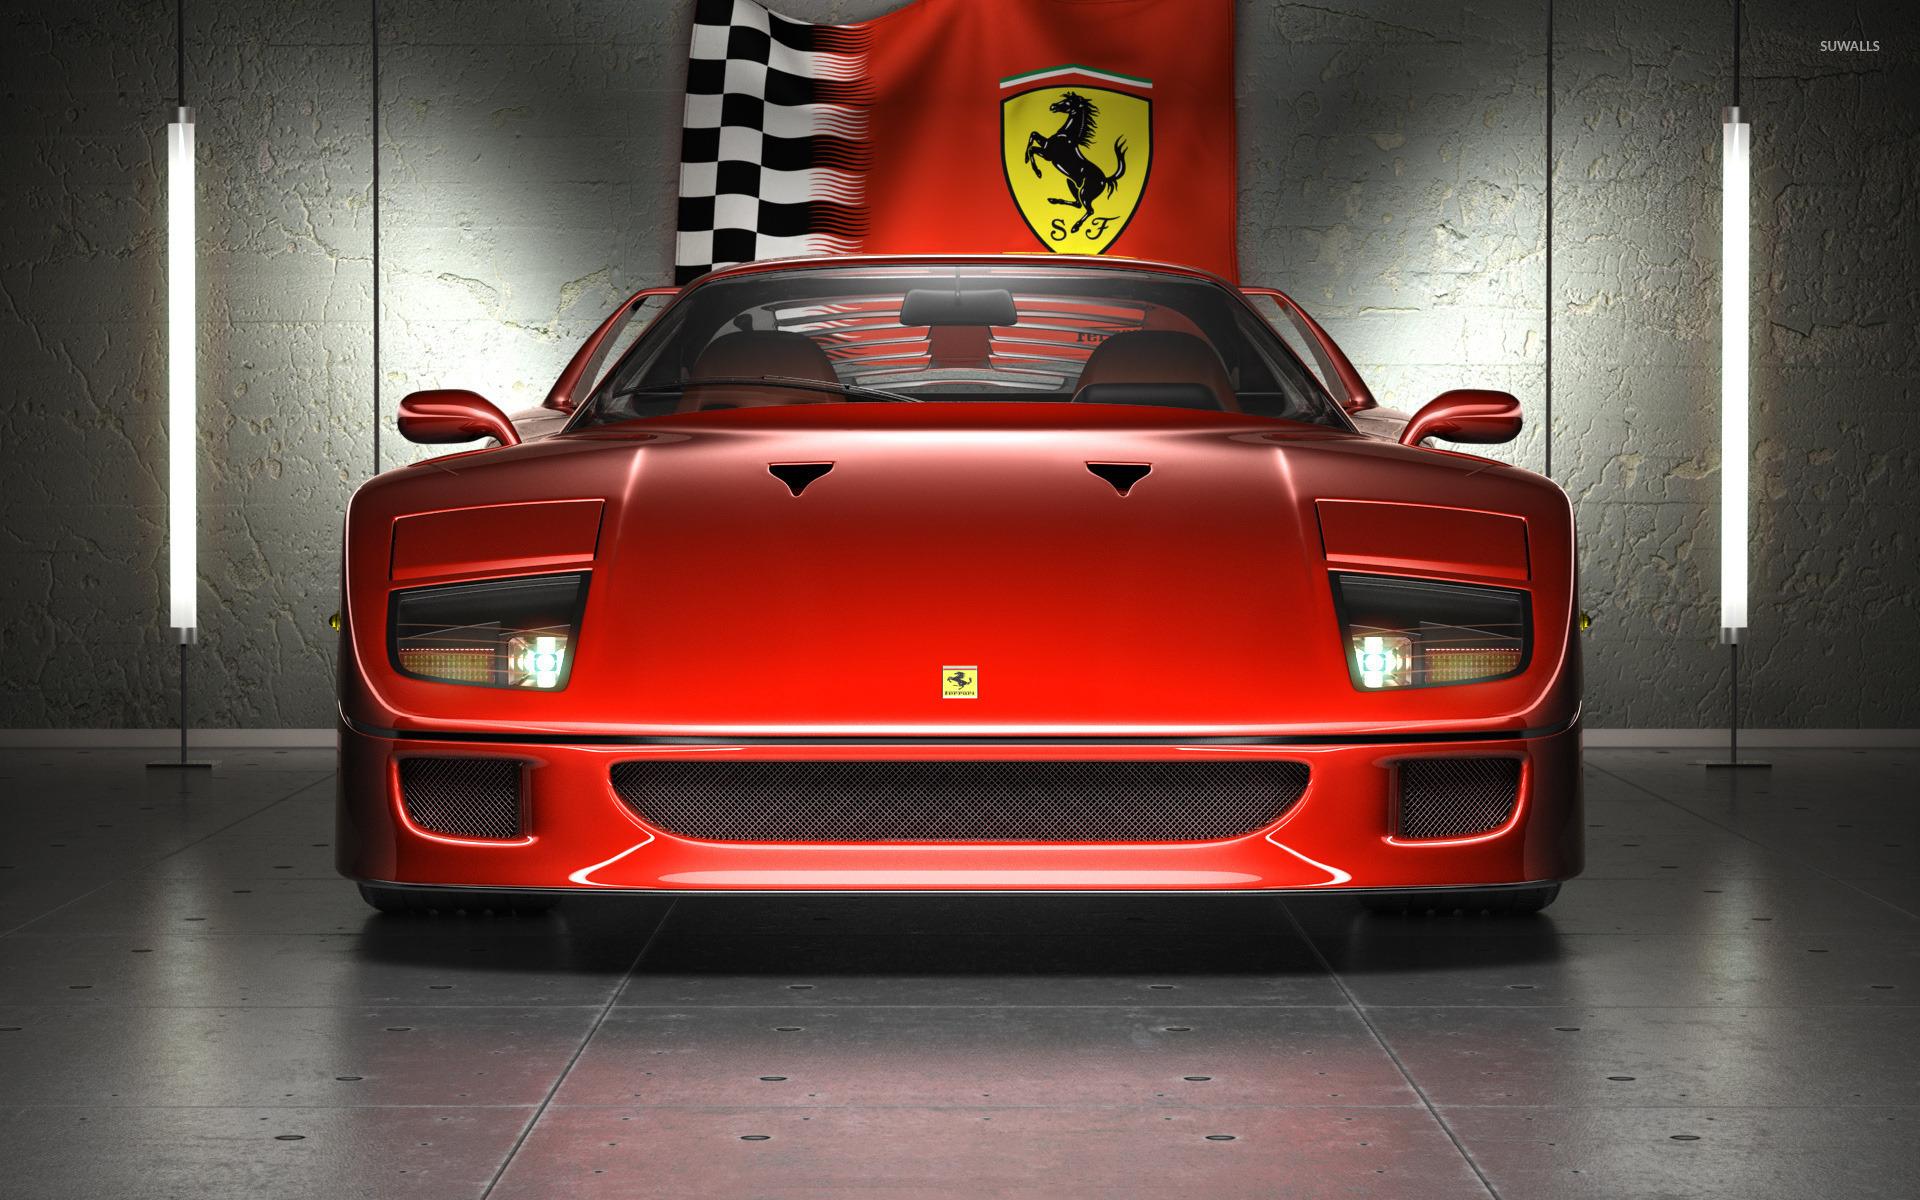 Cars Hd Wallpapers 1080p For Pc Bmw Ferrari F40 2 Wallpaper Car Wallpapers 45849